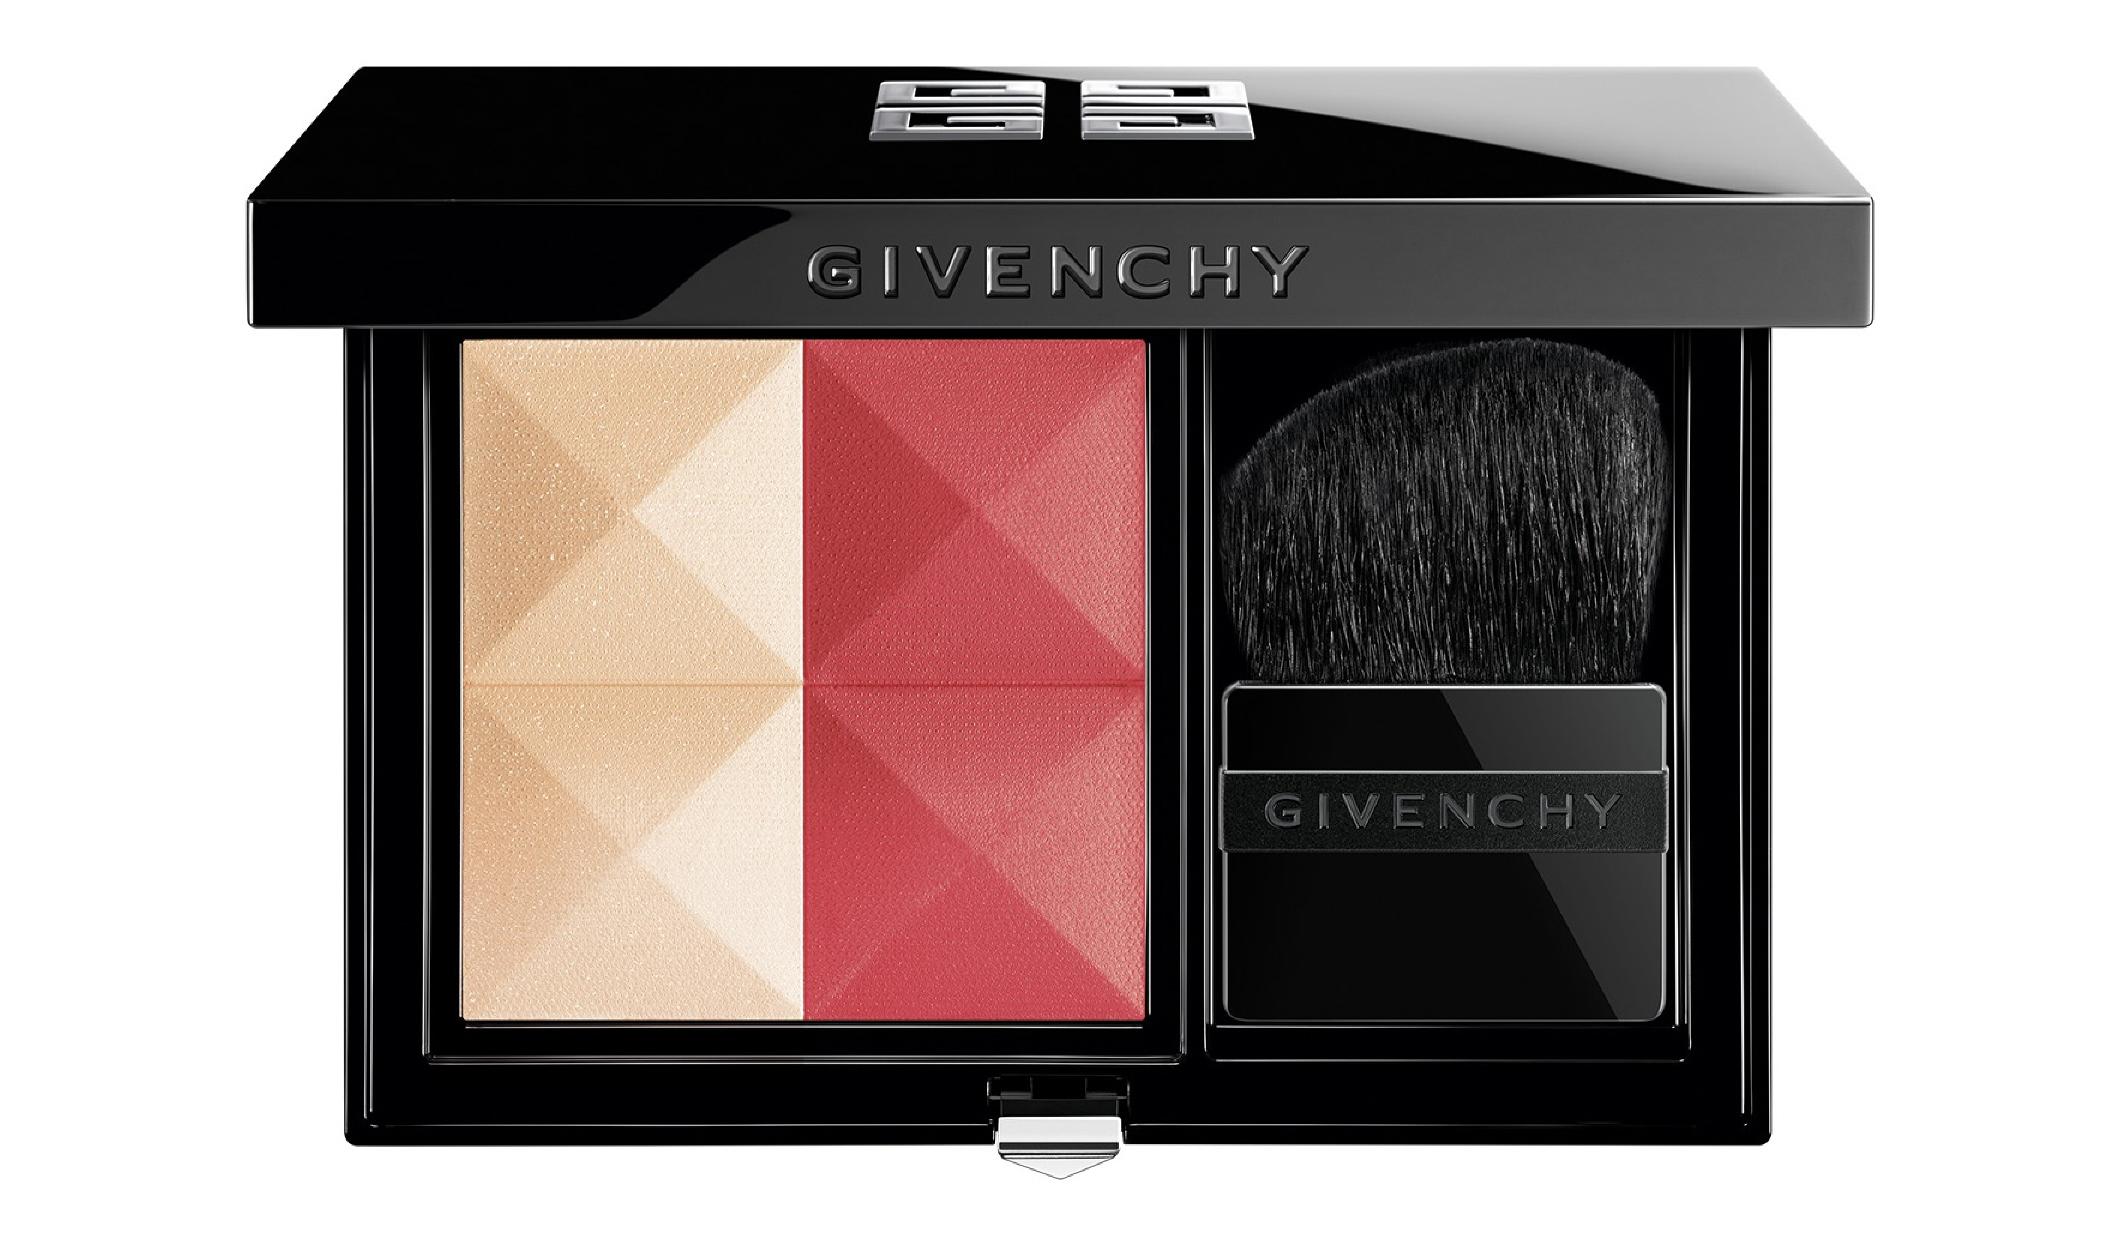 GIVENCHY|ときめきの瞬間をプレシャスな色彩で表現するチーク